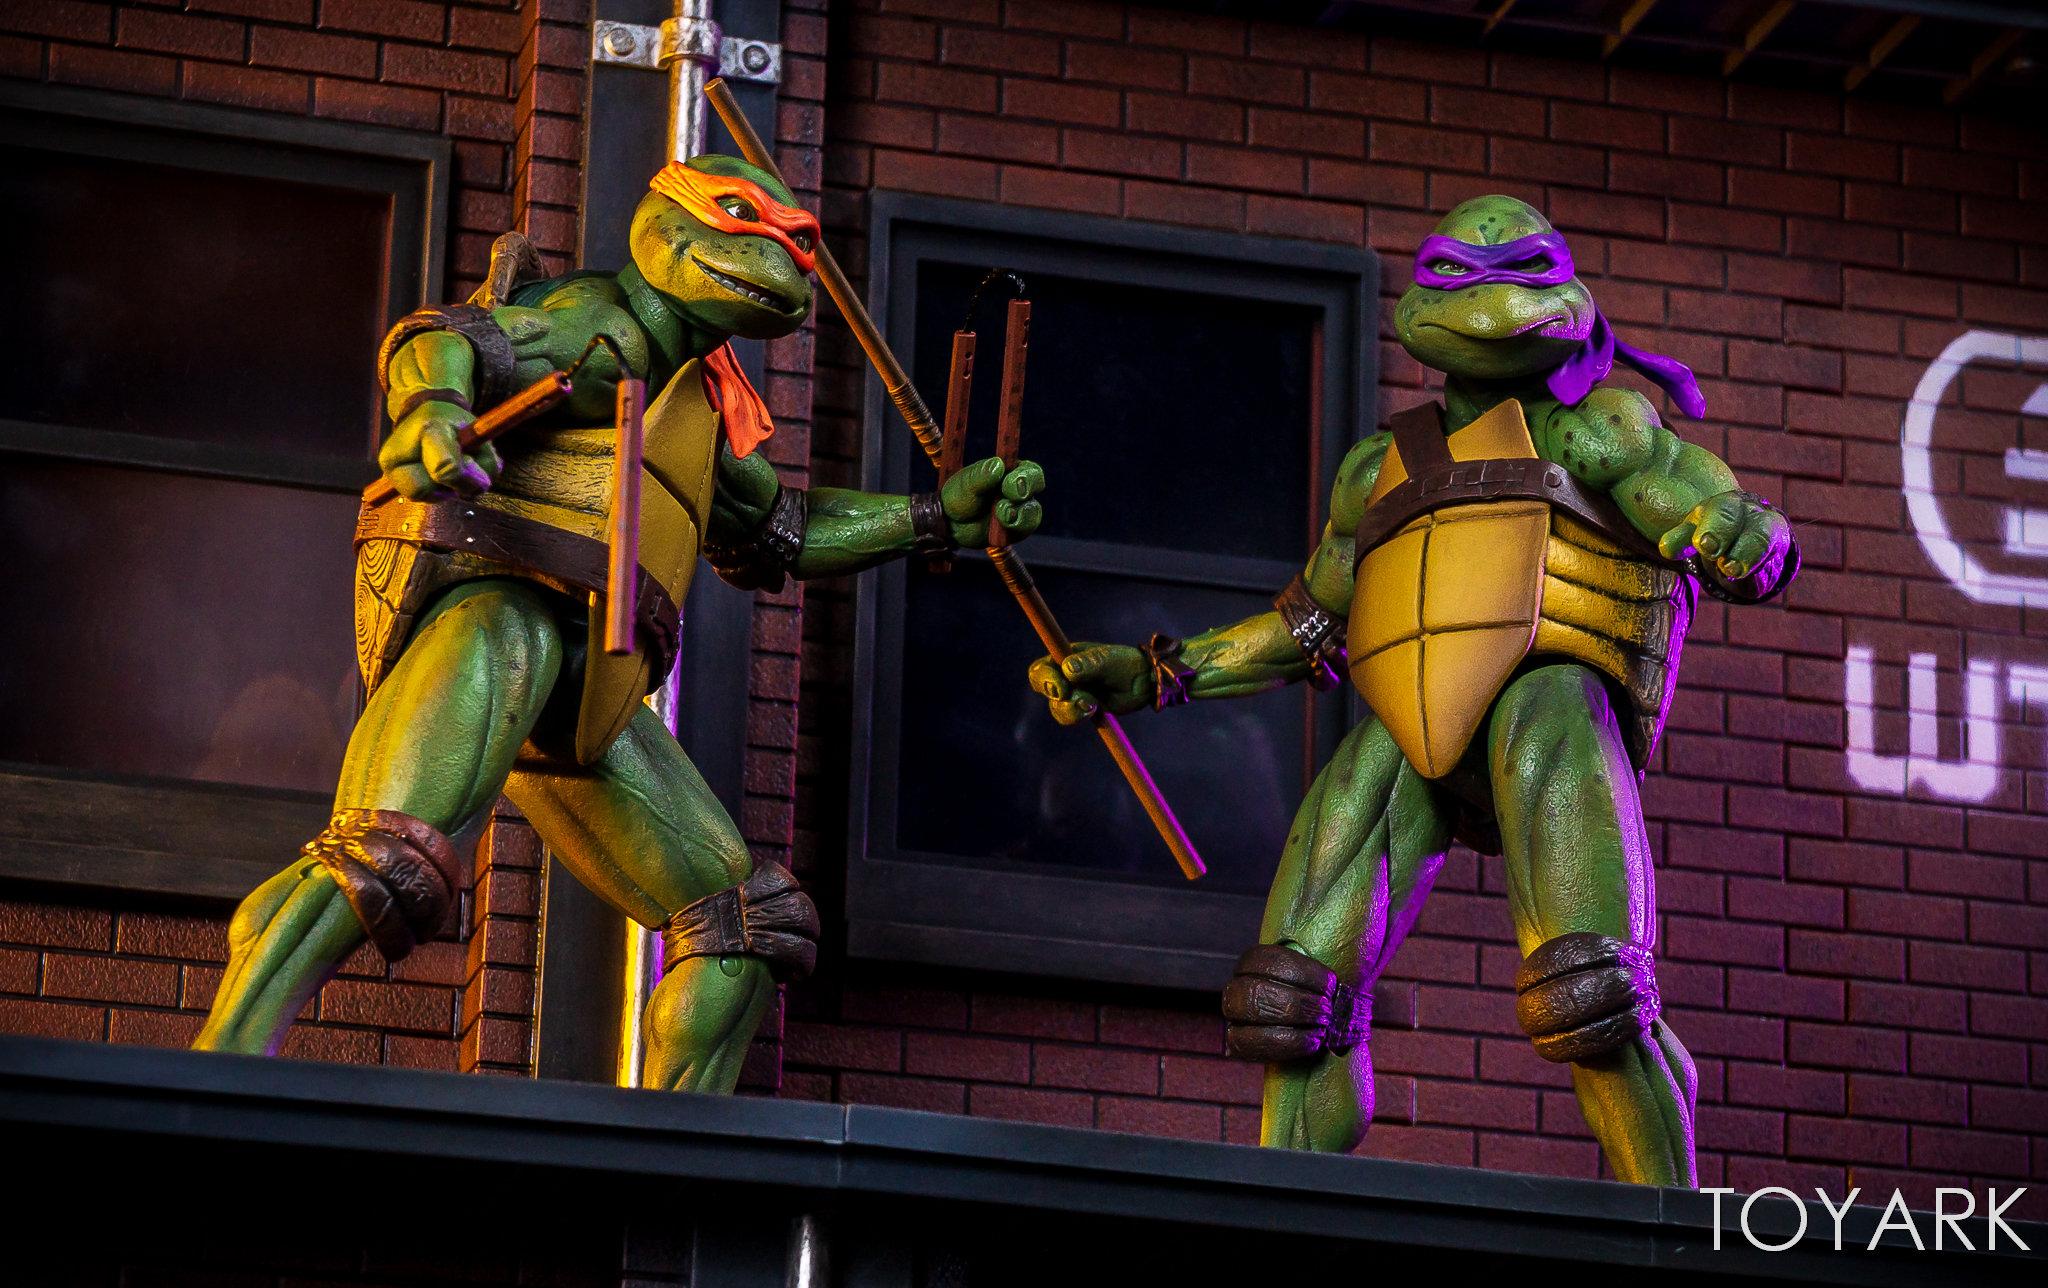 Teenage Mutant Ninja Turtles 1990 Exclusive Set (Neca) GwwkdSQg_o